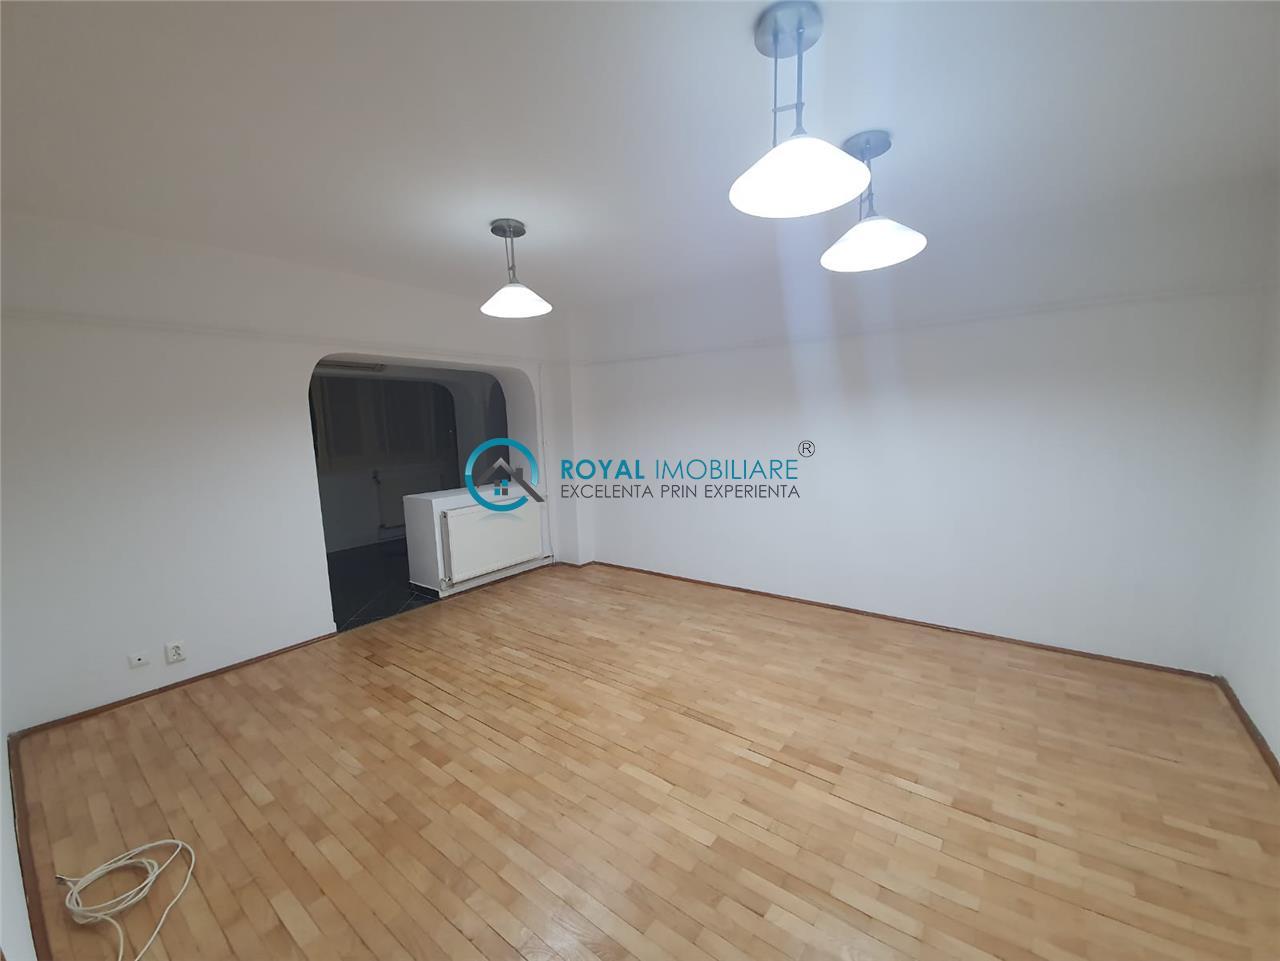 Royal Imobiliare    Inchiriere apartament zona Gheorghe Doja